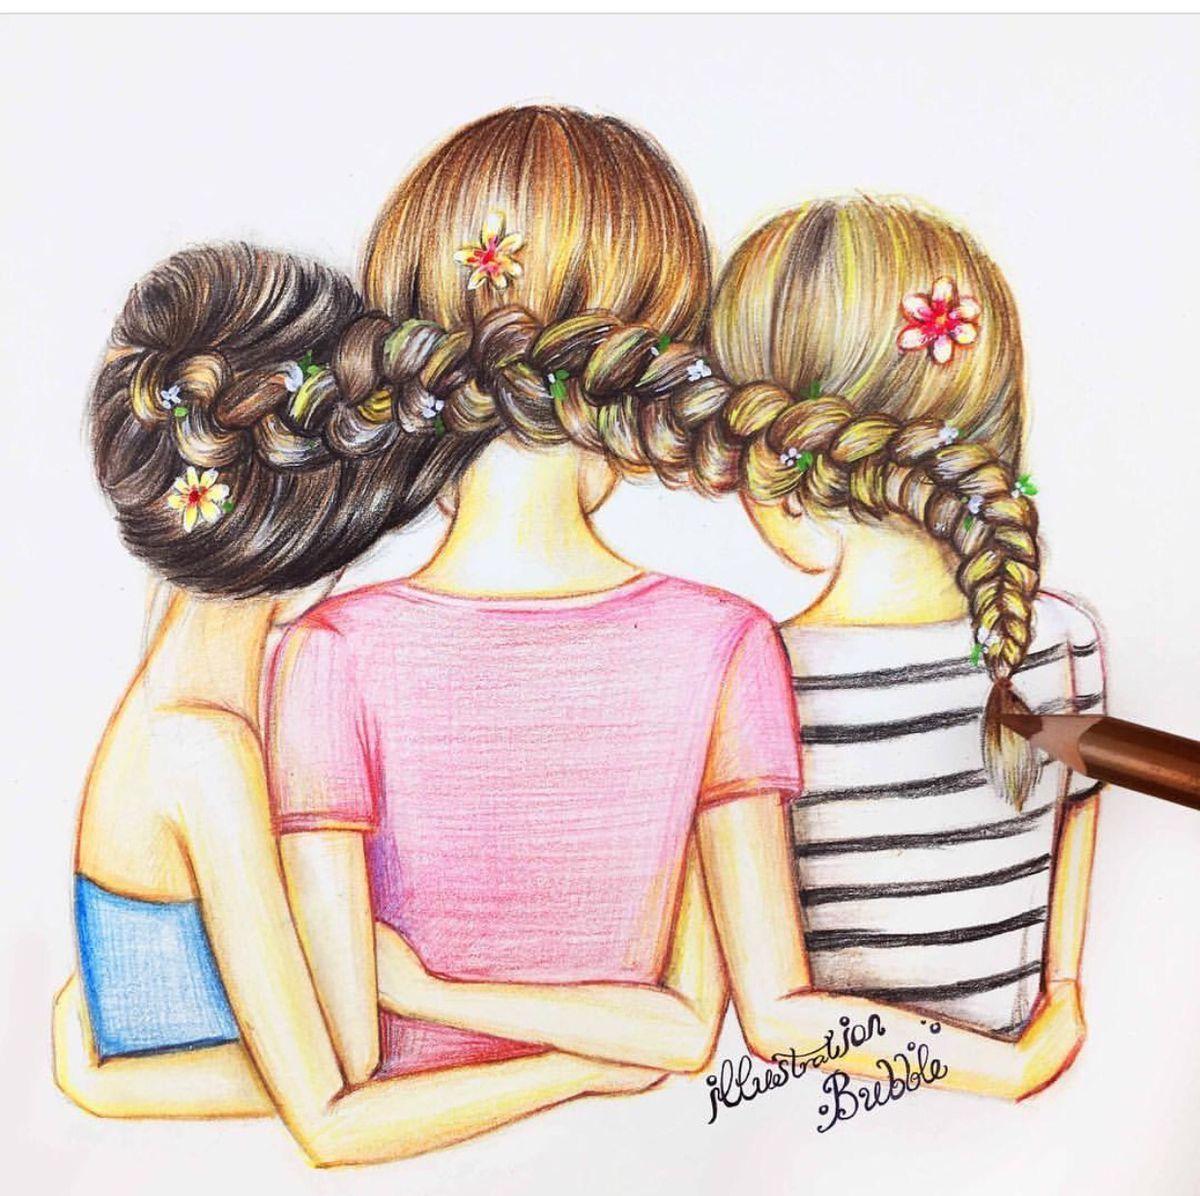 Pin de anais gesnot en dessin   Pinterest   Dibujo, Fondos y Amigos